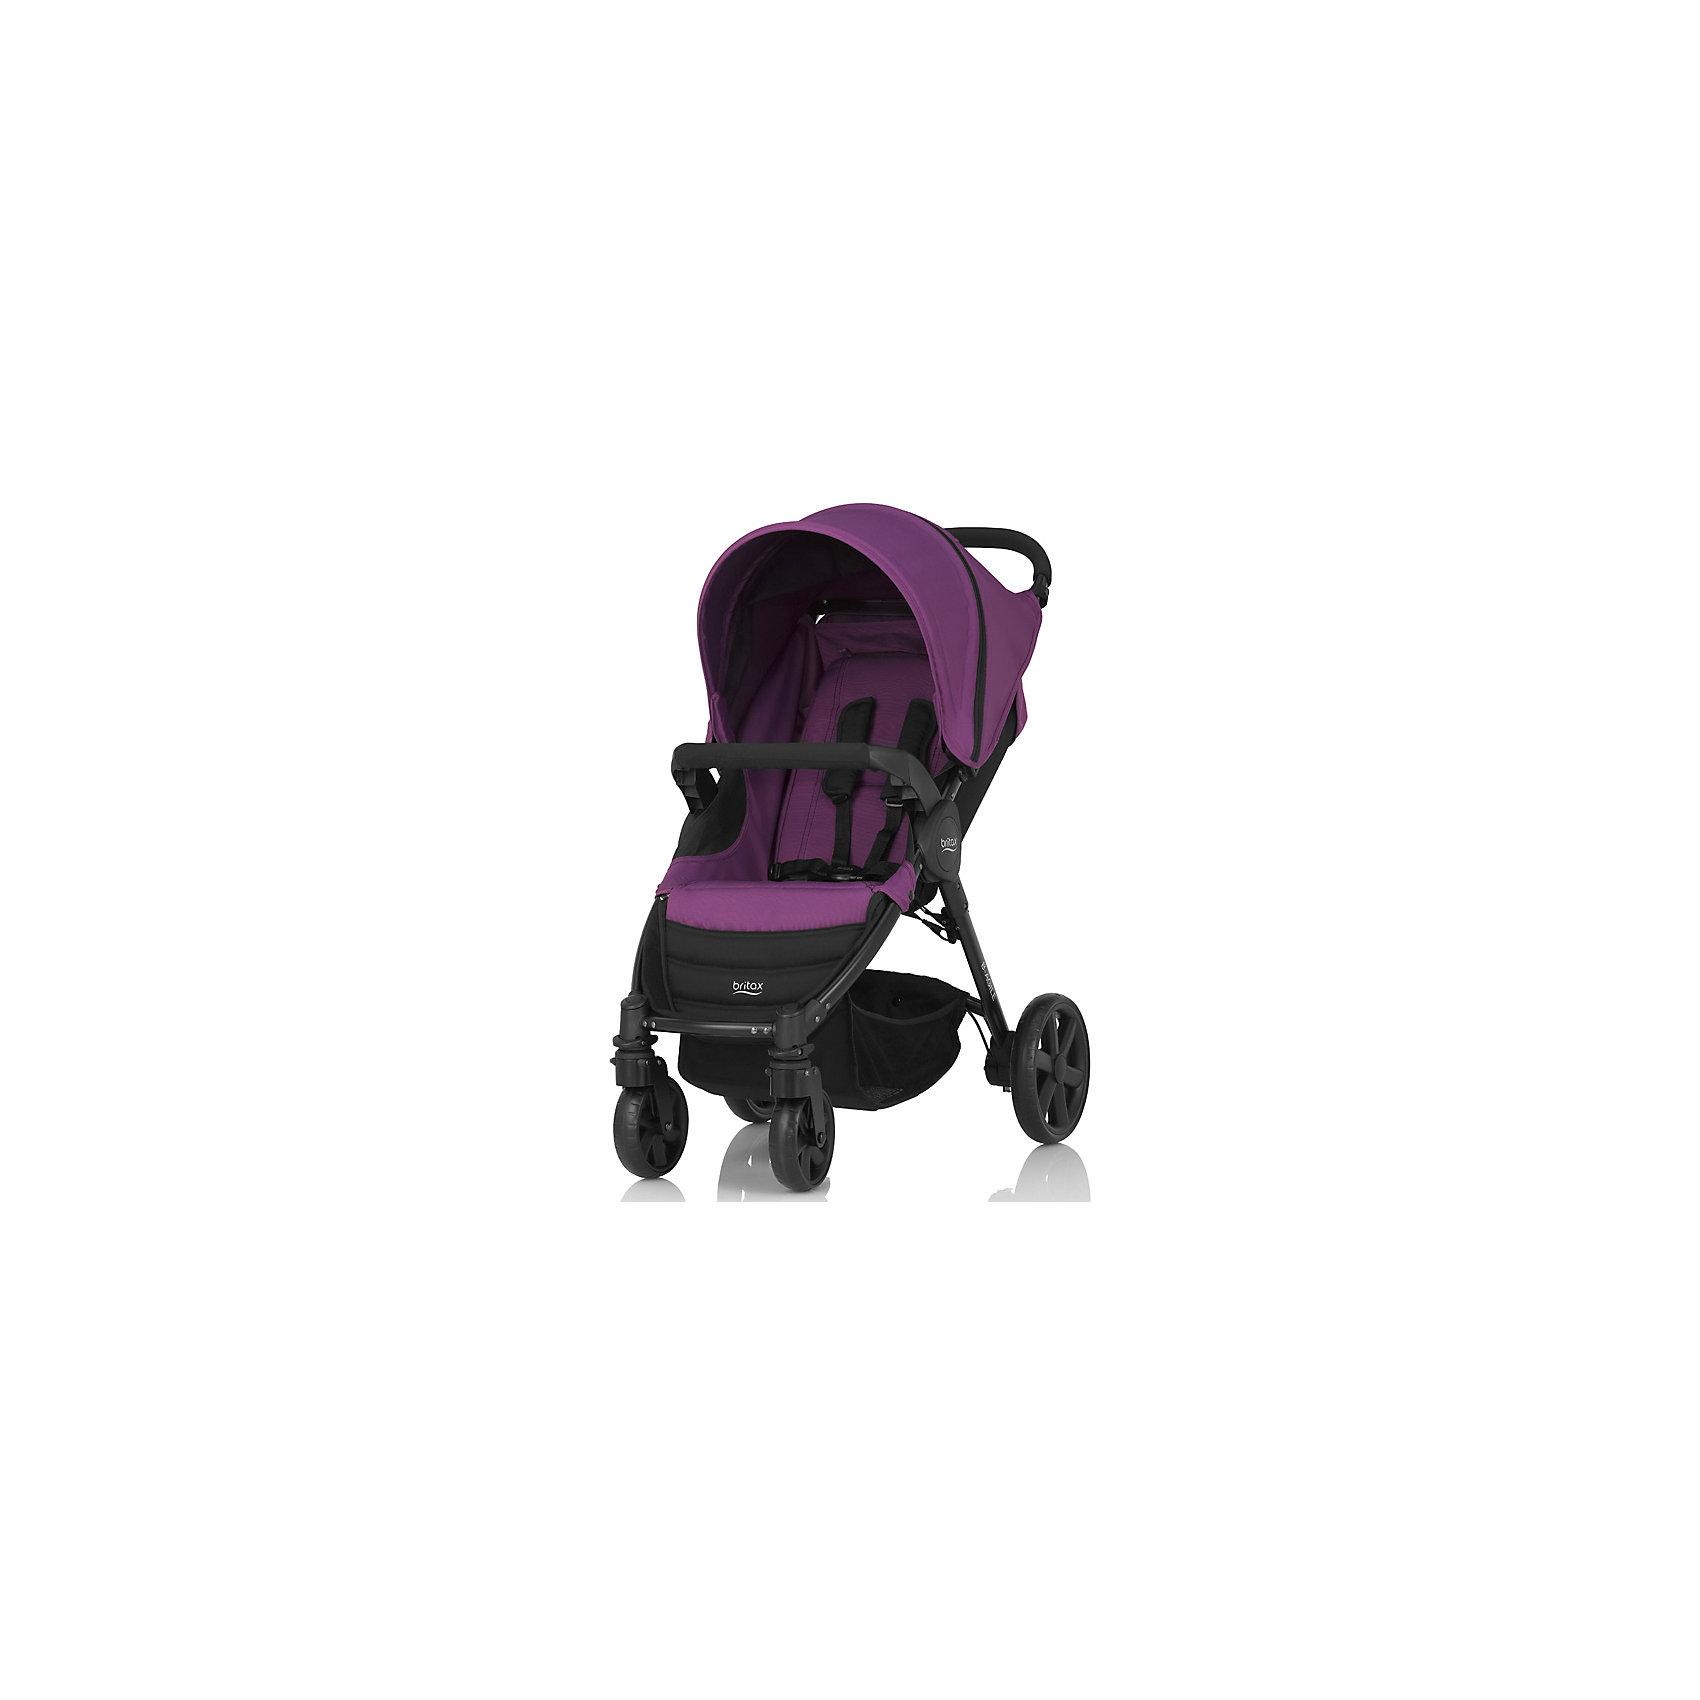 Прогулочная коляска Britax B-Agile 4, Mineral Lilac